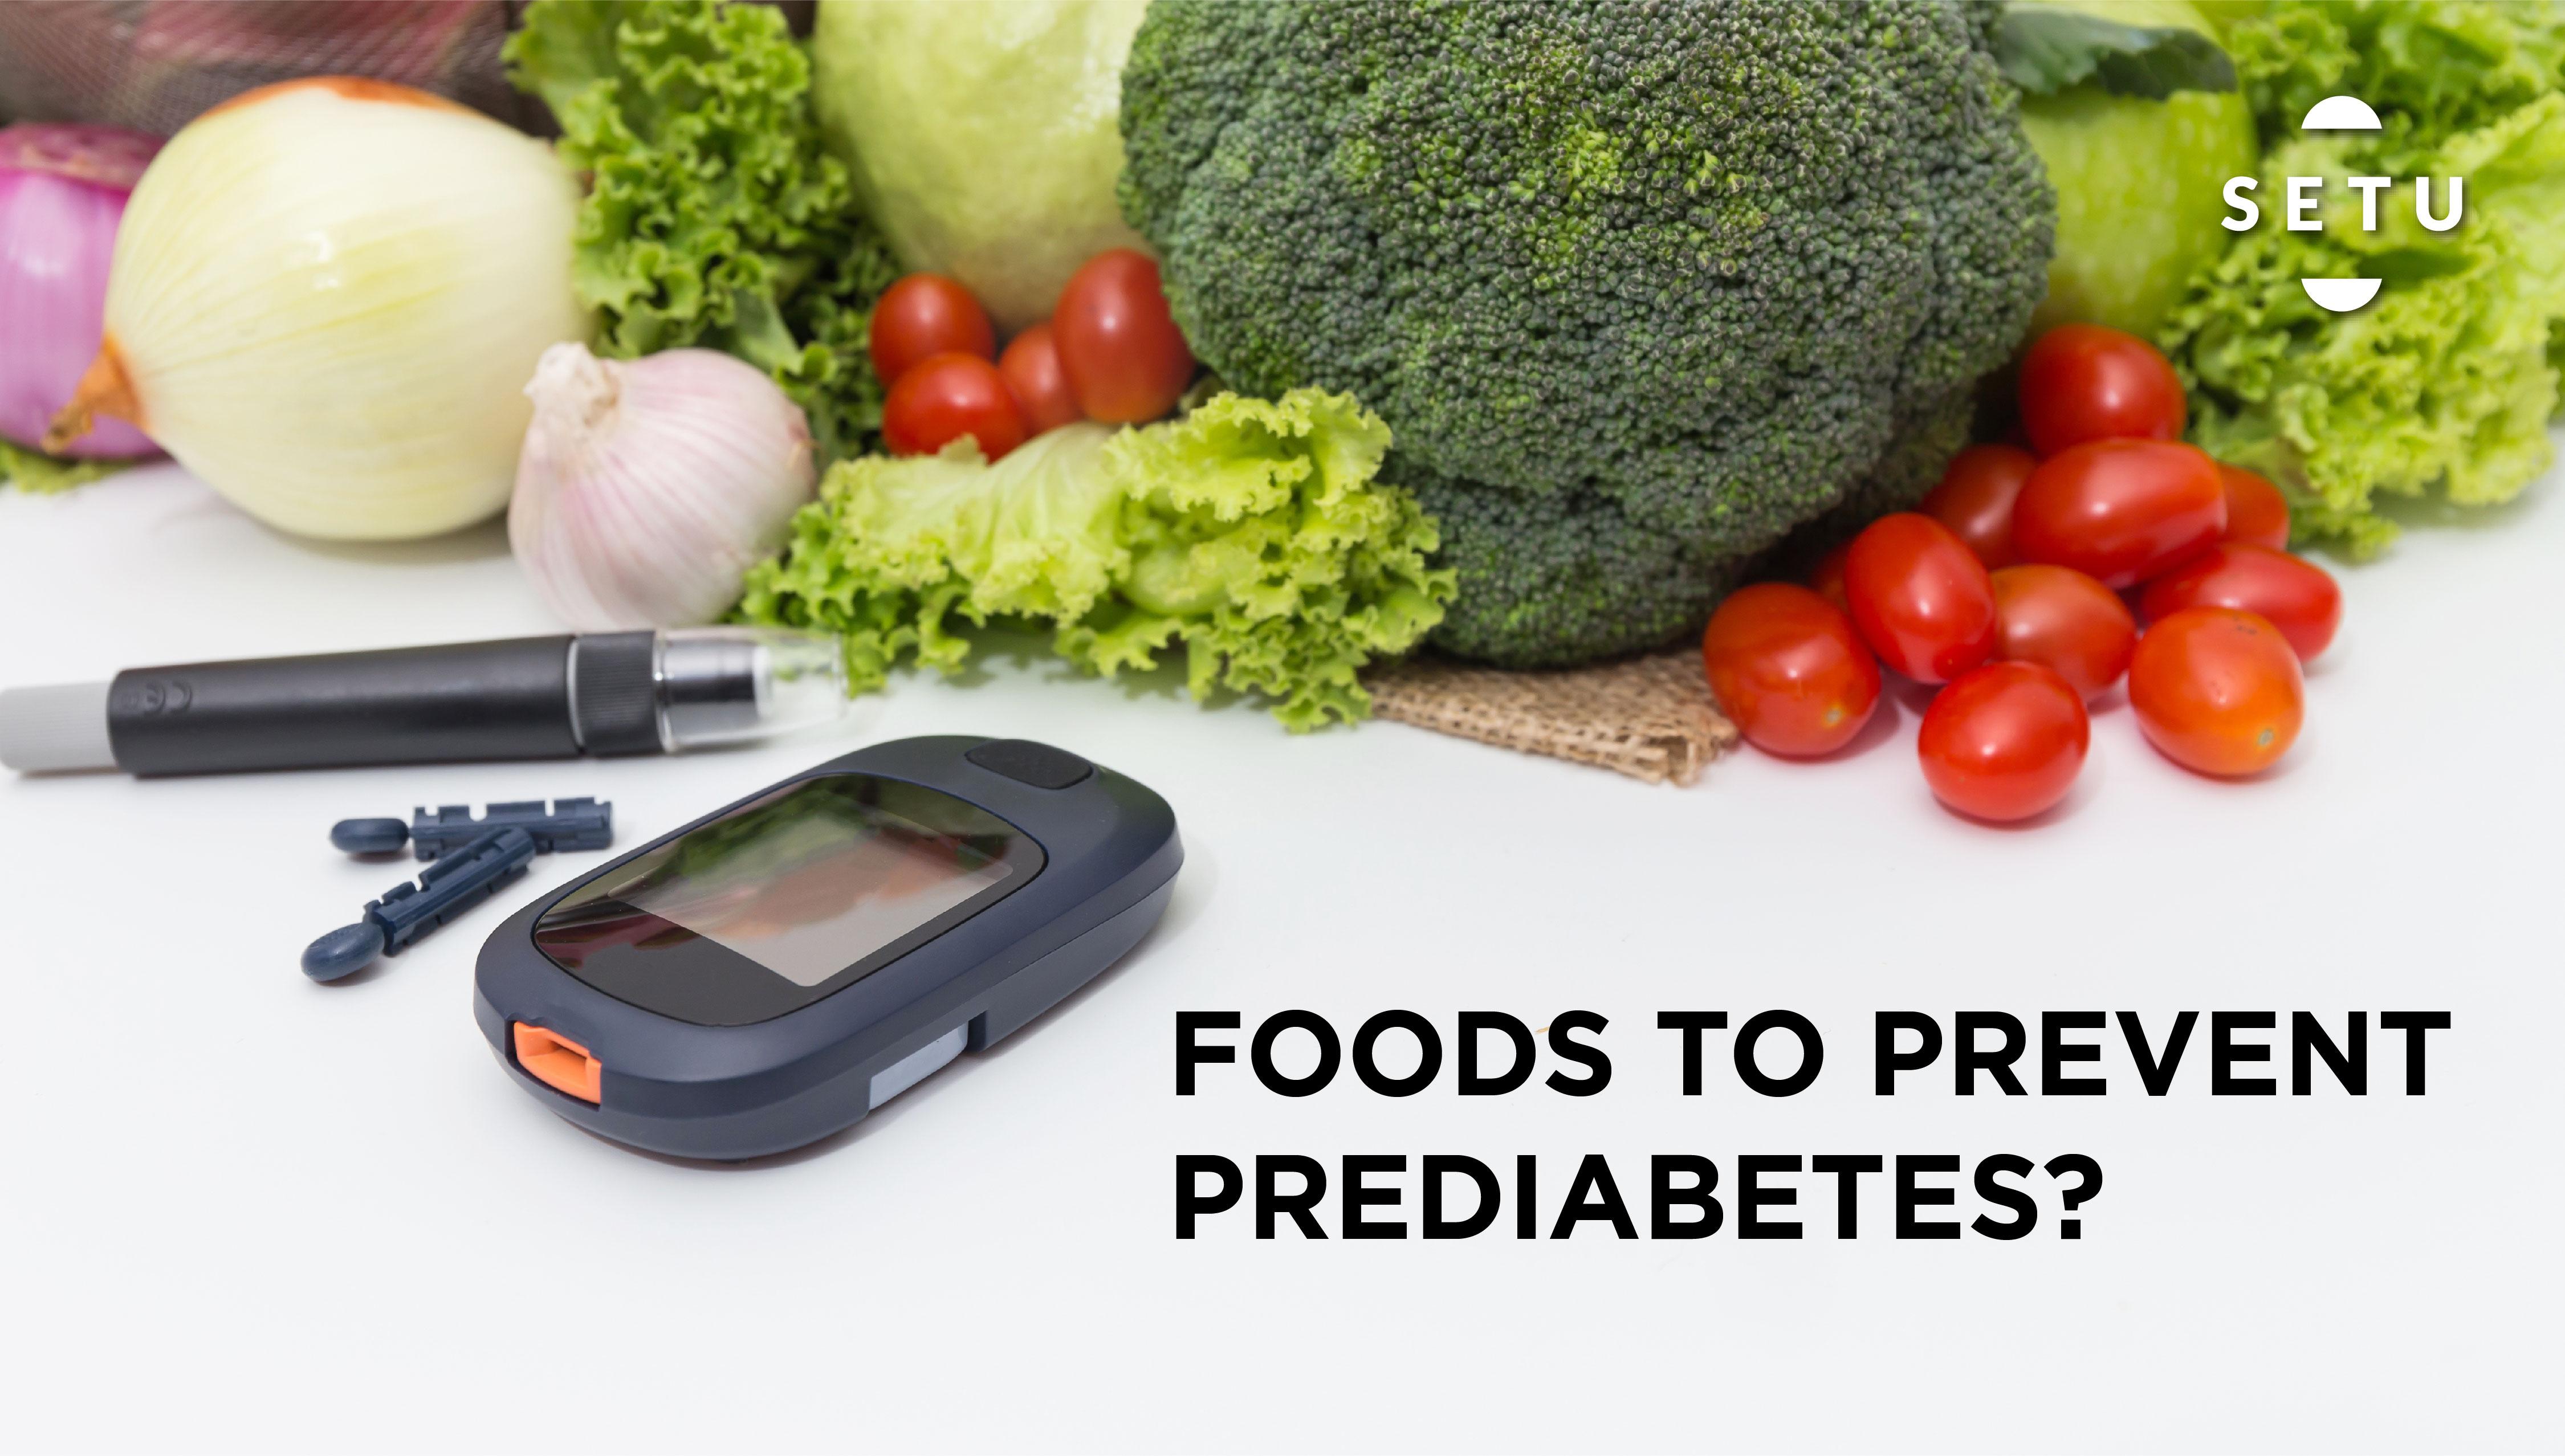 Foods to prevent prediabetes